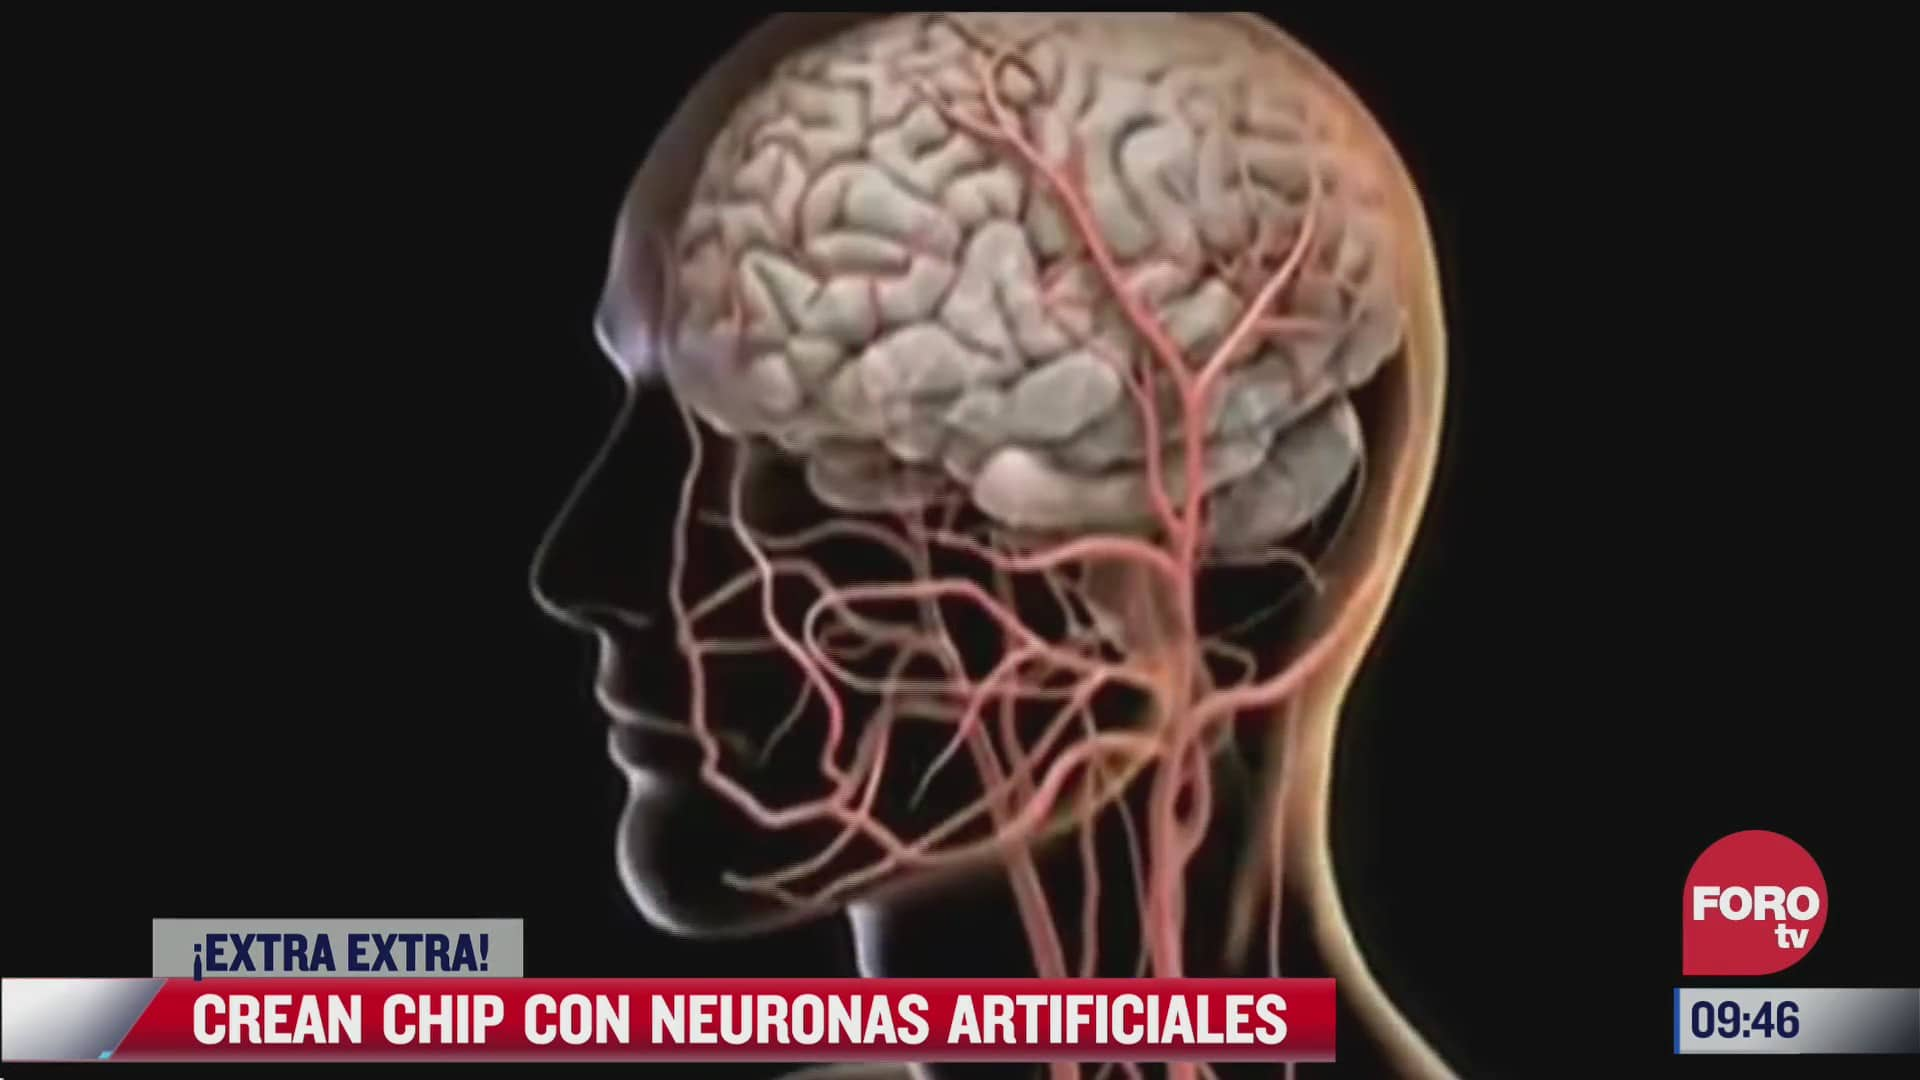 extra extra crean chip con neuronas artificiales